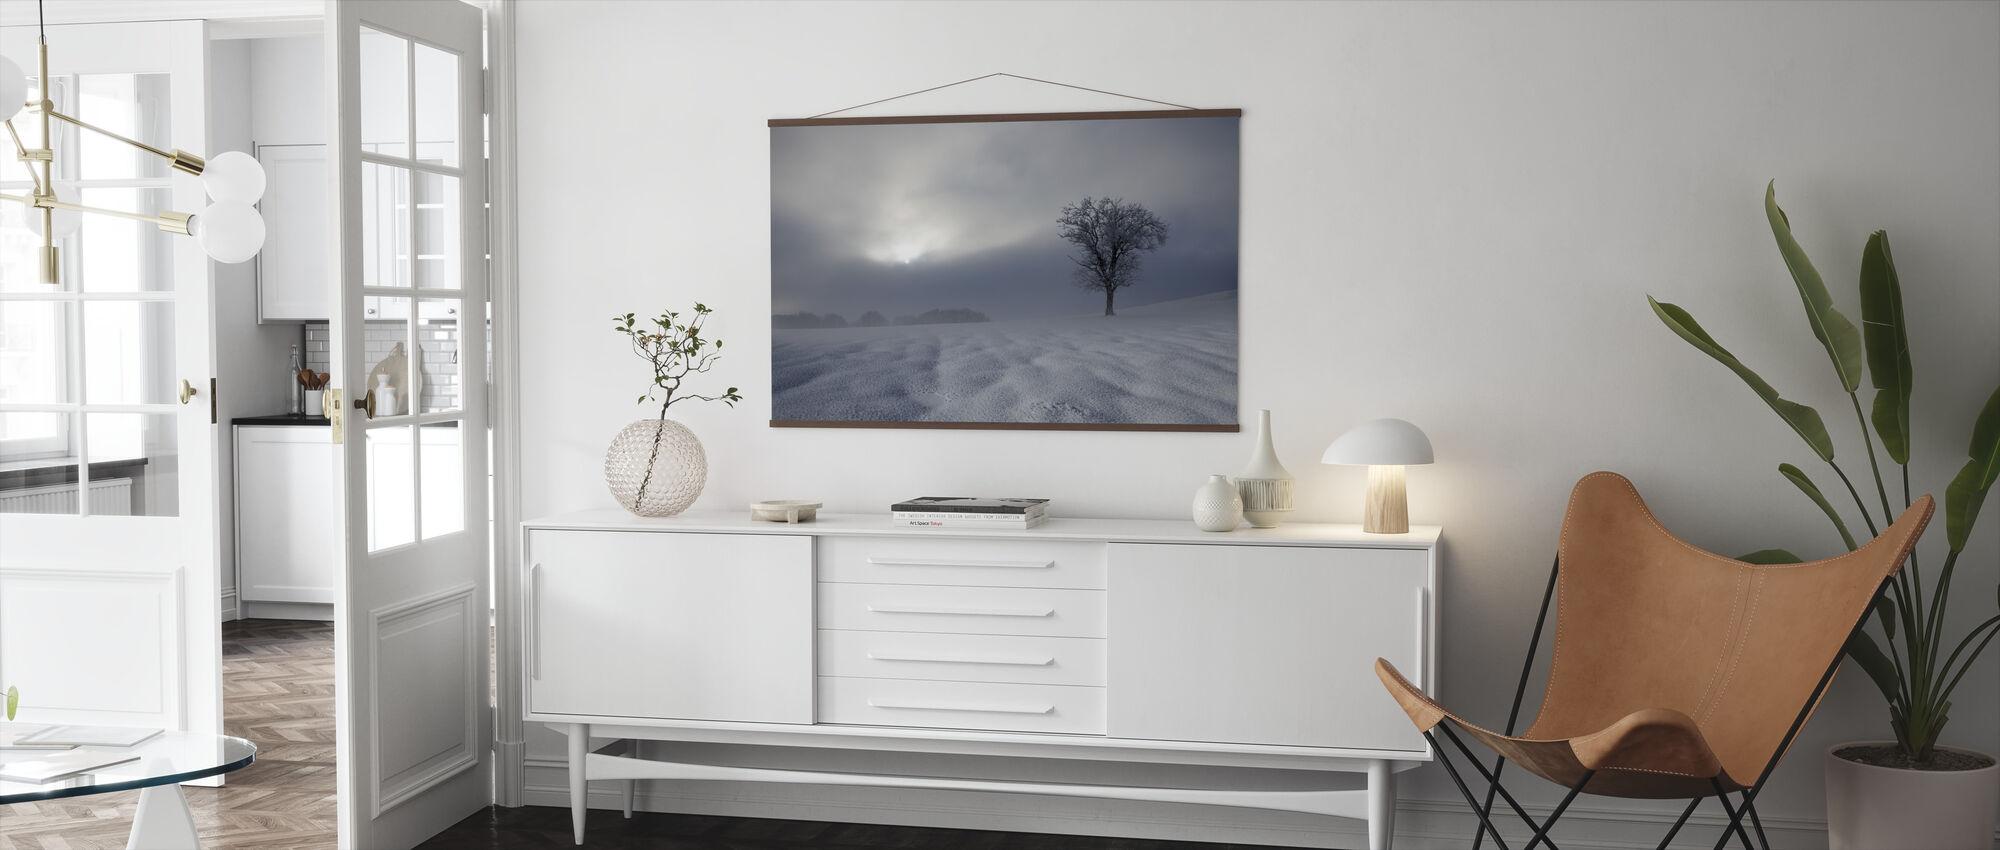 Winter Impression - Poster - Living Room